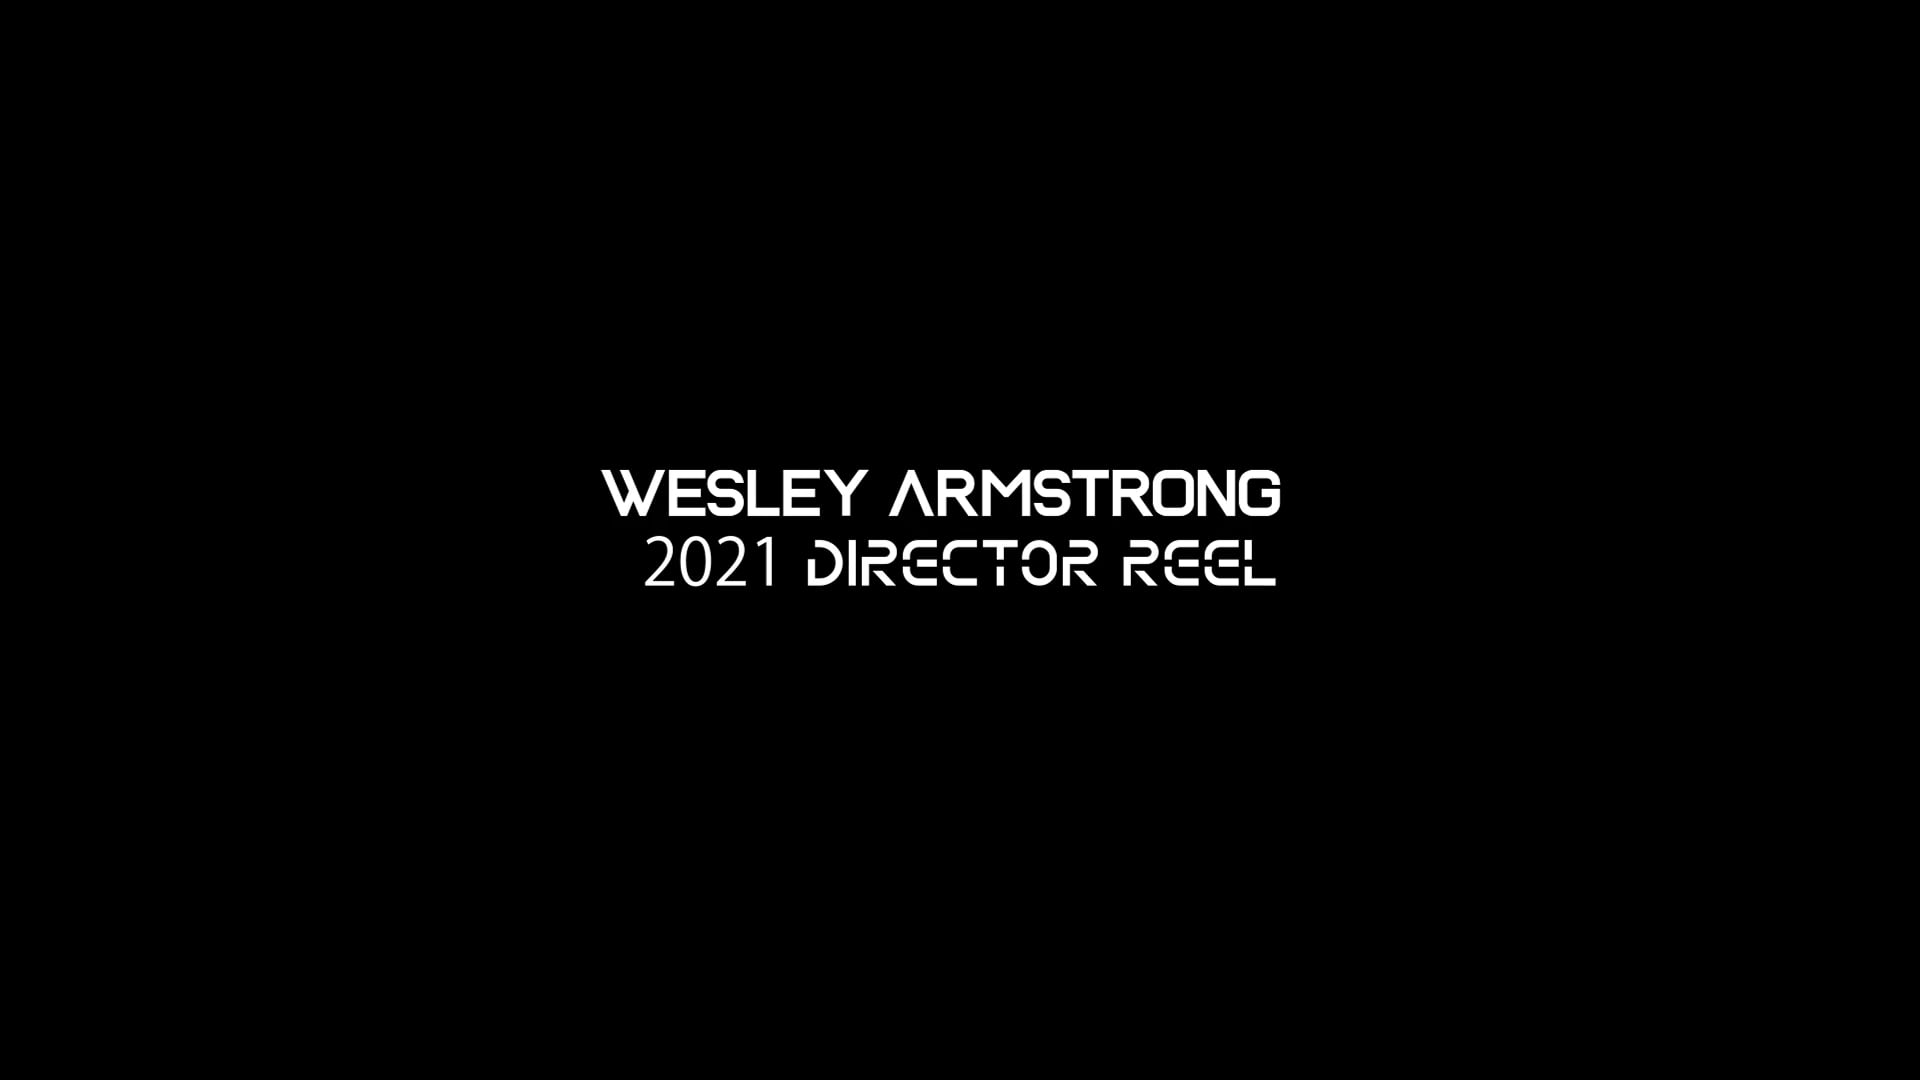 Wes Armstrong 2021 directors Reel